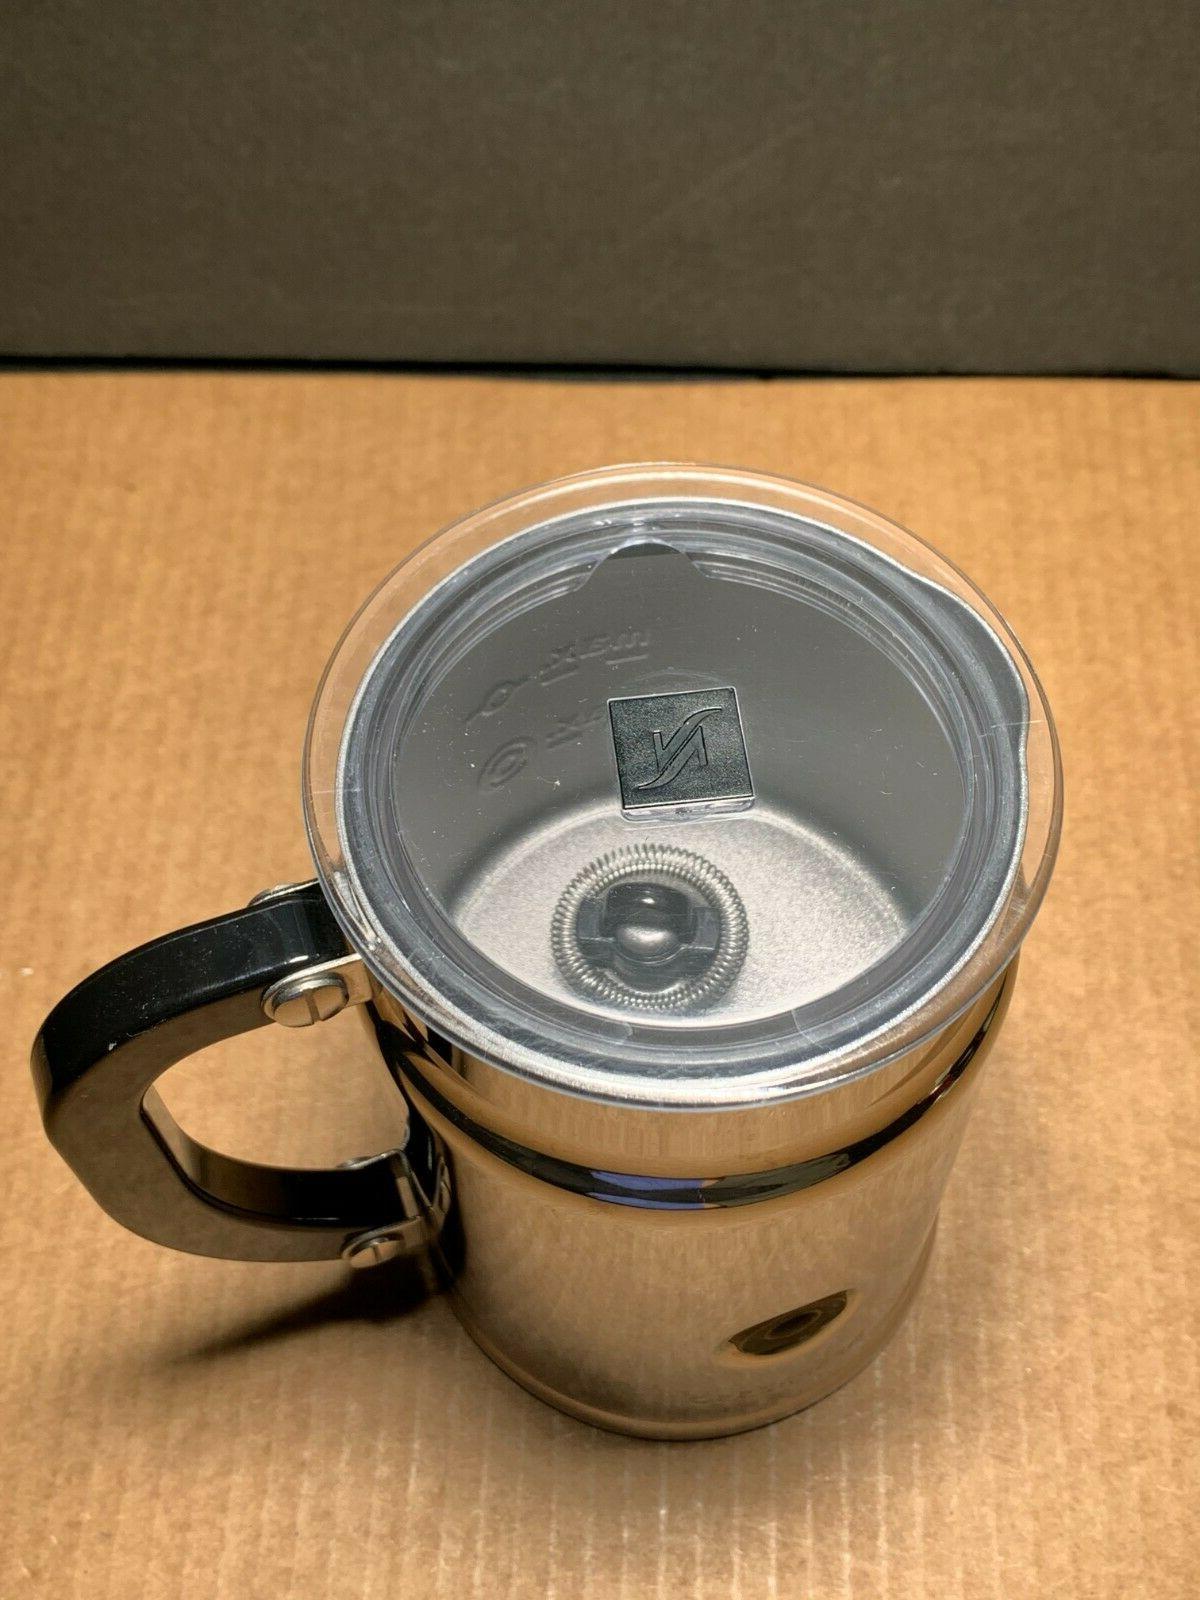 Nespresso Model Electric Stainless Steel Aeroccino